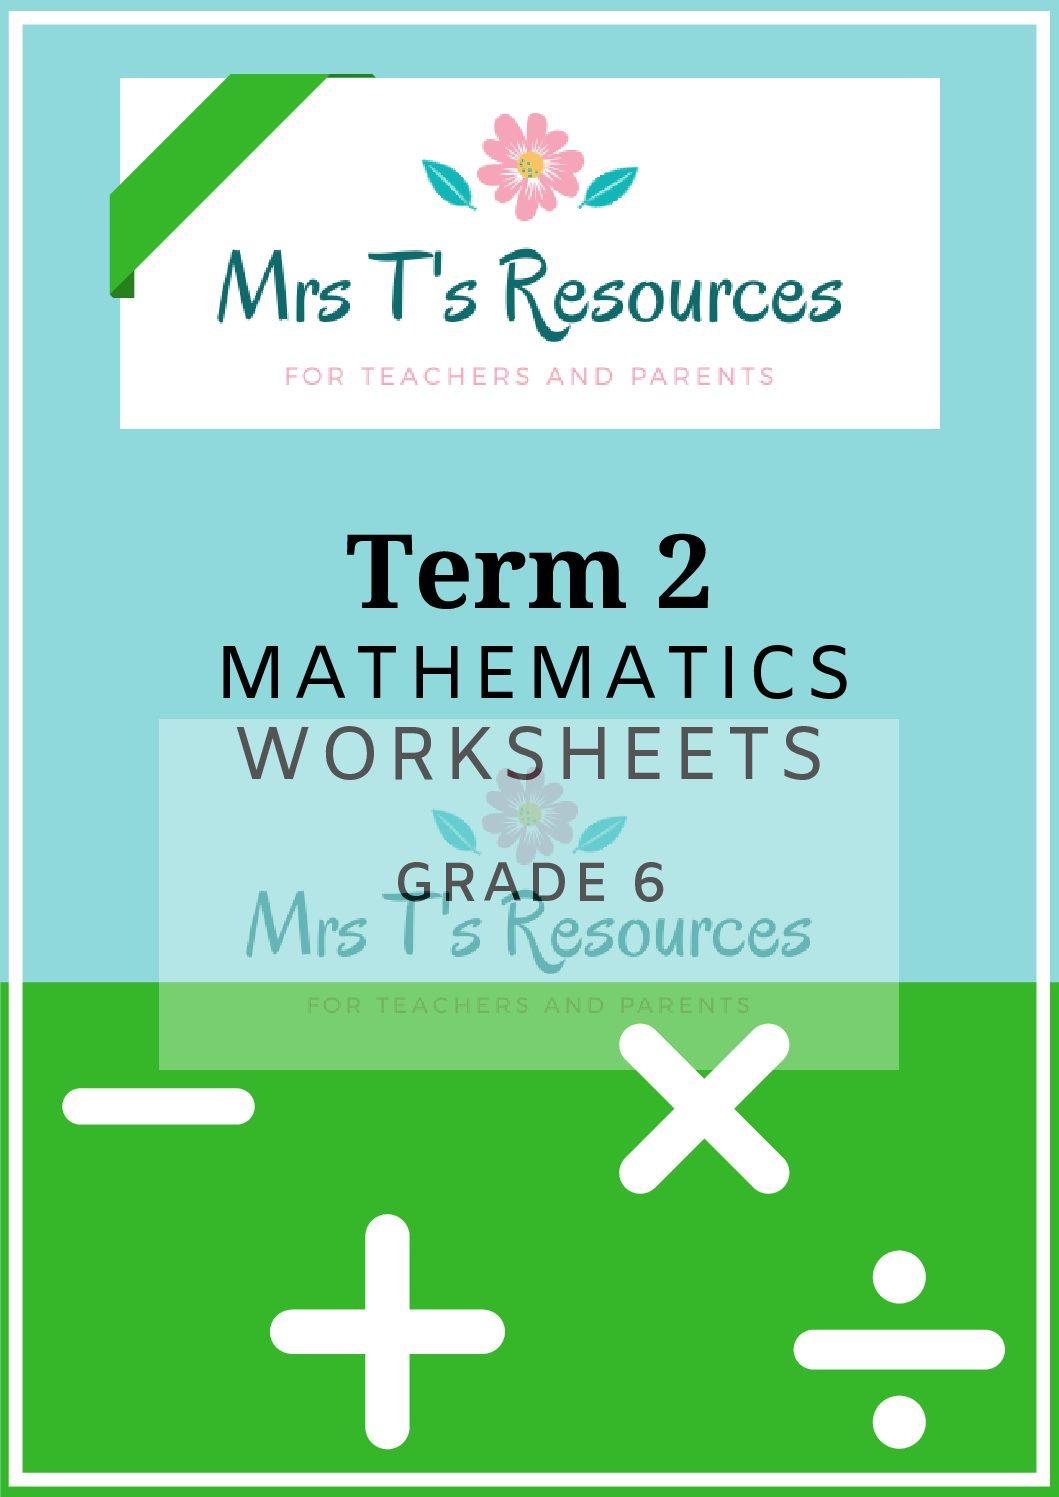 Grade 6 Mathematics Worksheets Term 2